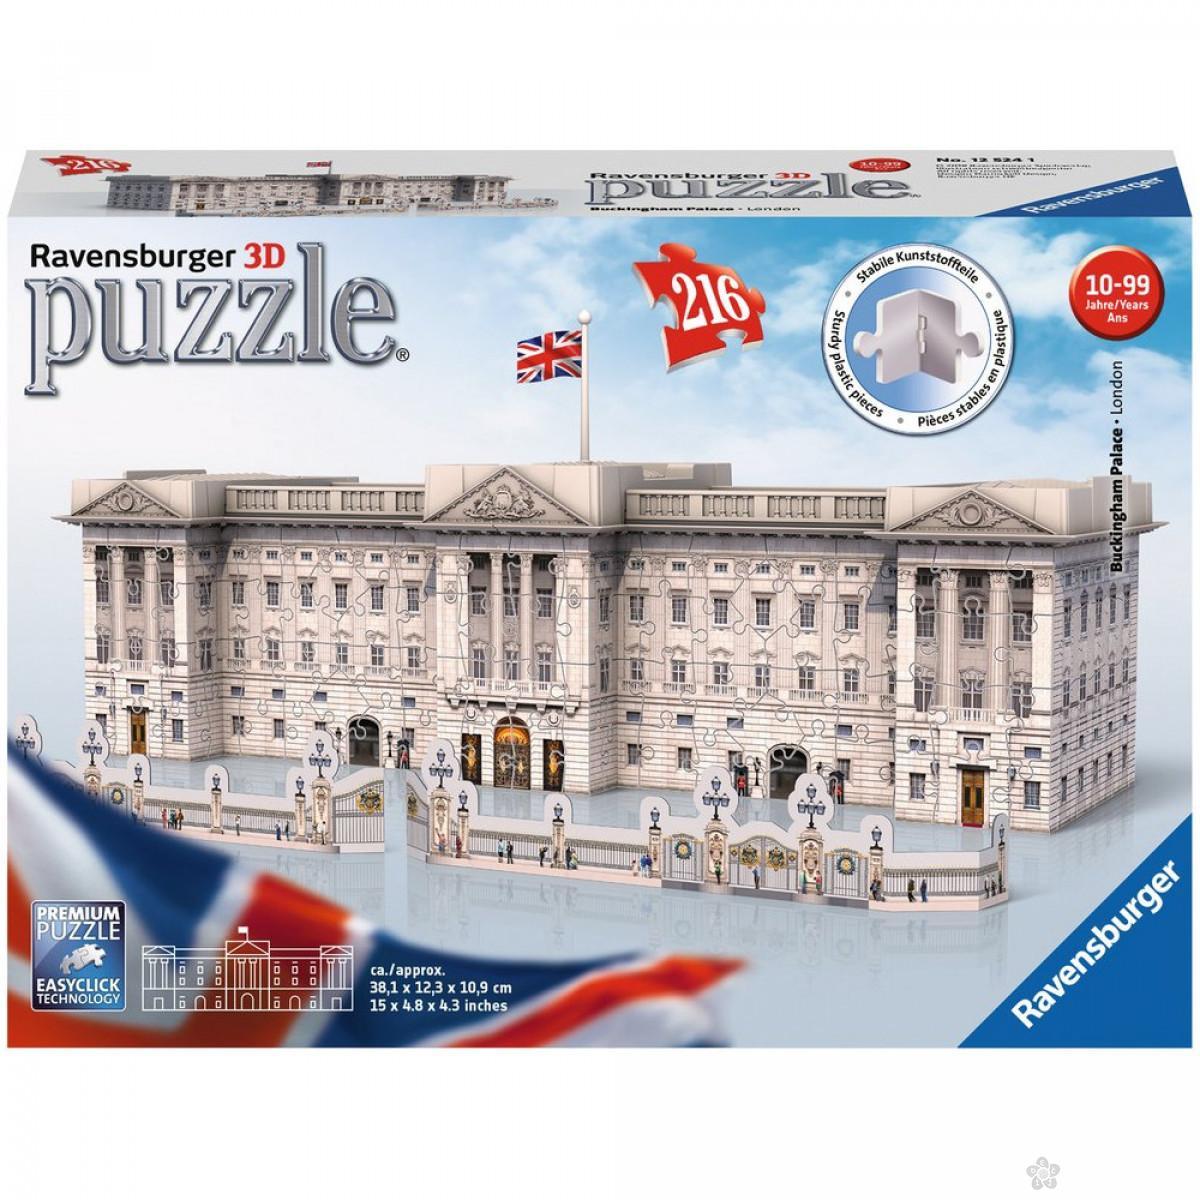 Ravensburger 3D puzzle (slagalice) - Bakingemska palata, RA12524